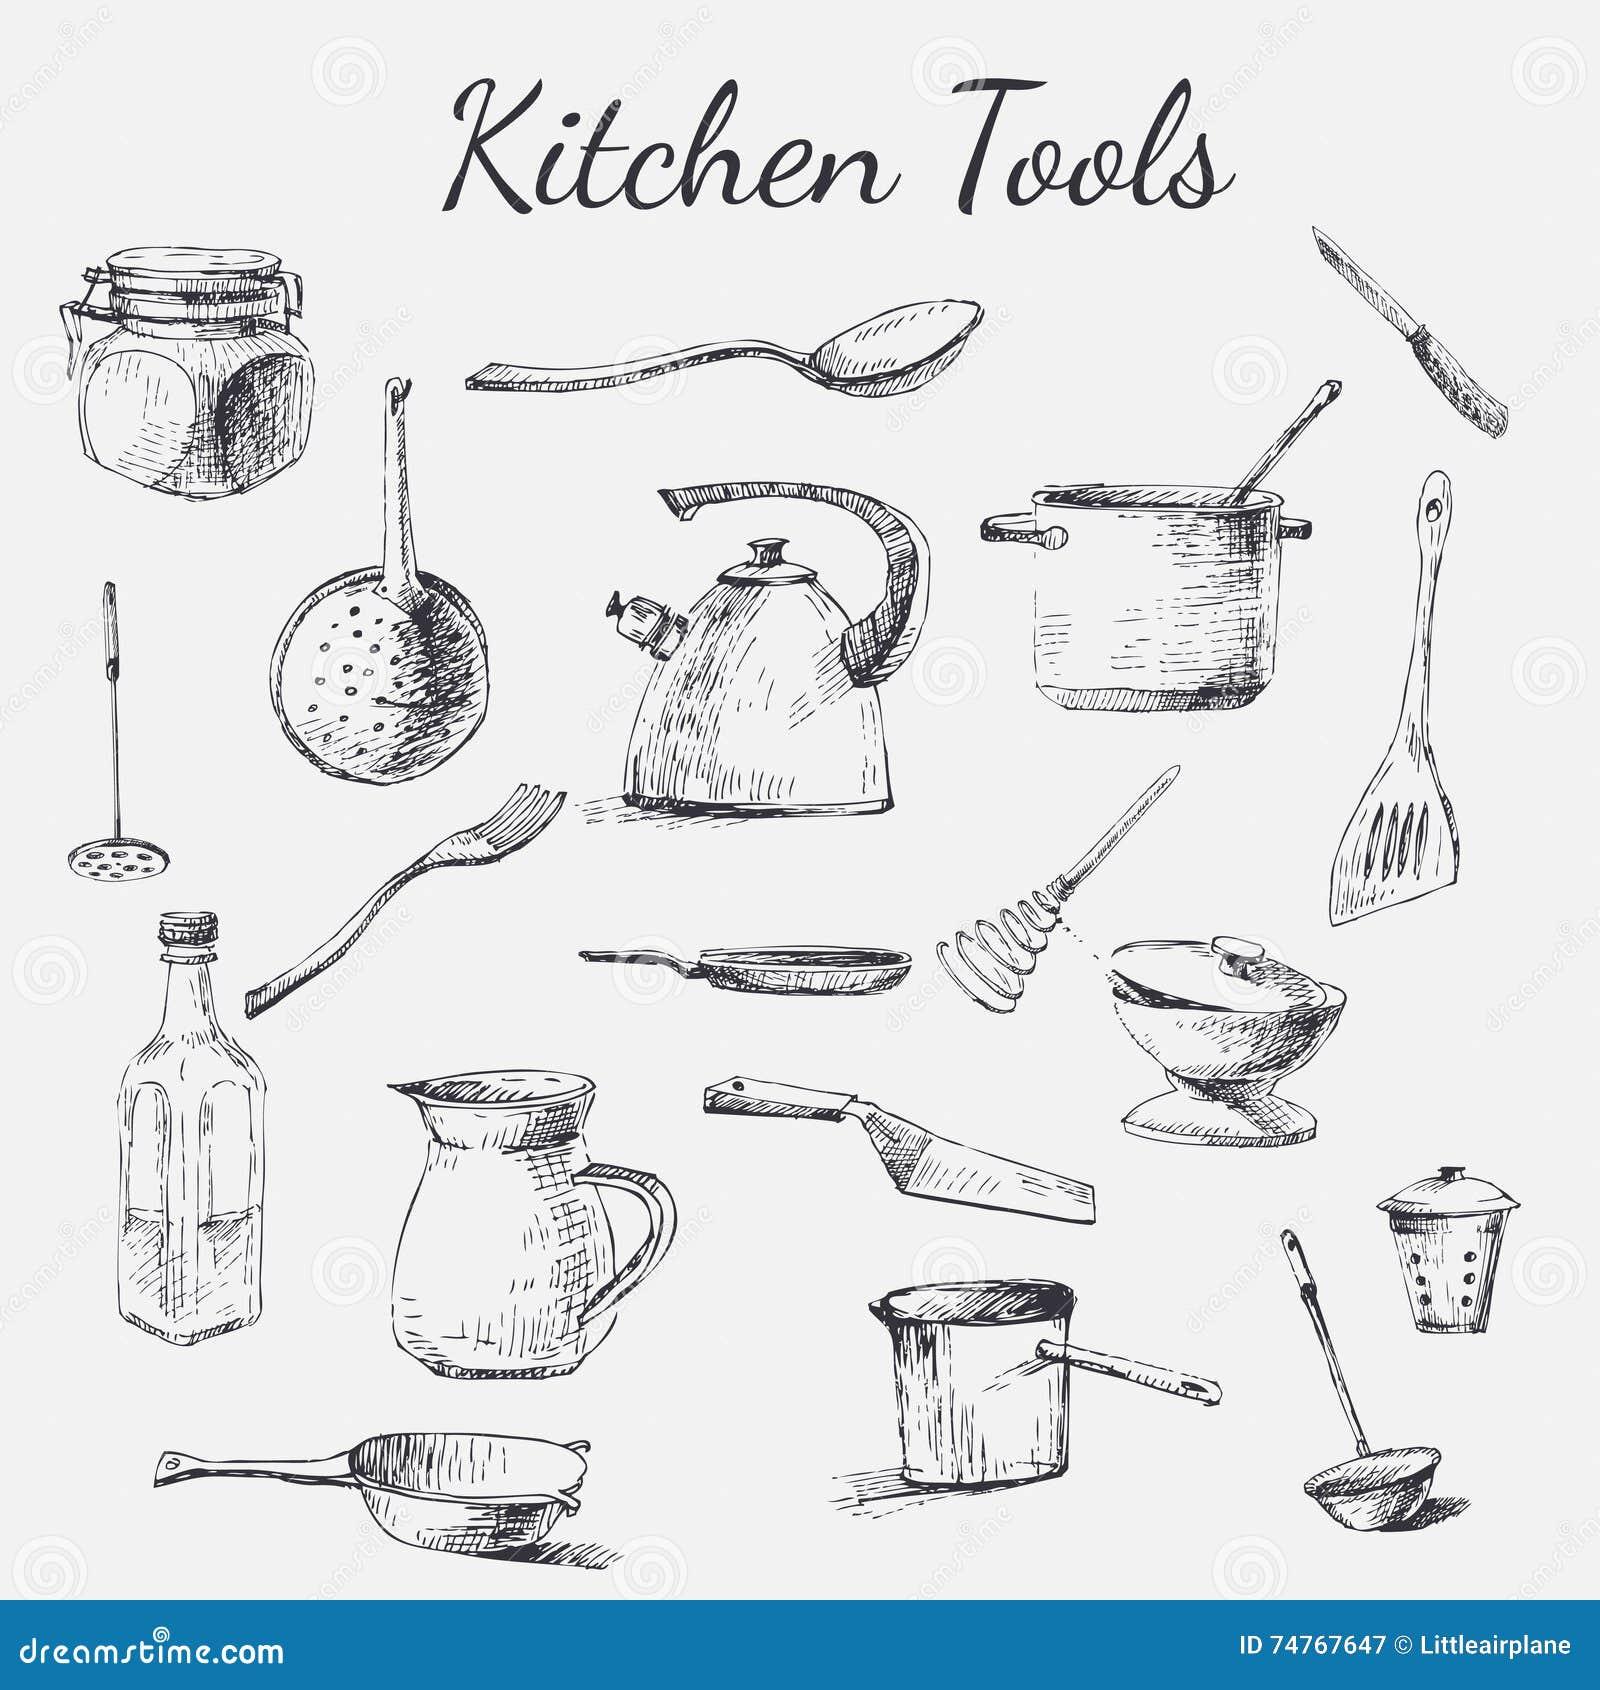 Kitchen tools drawing - Design Kitchen